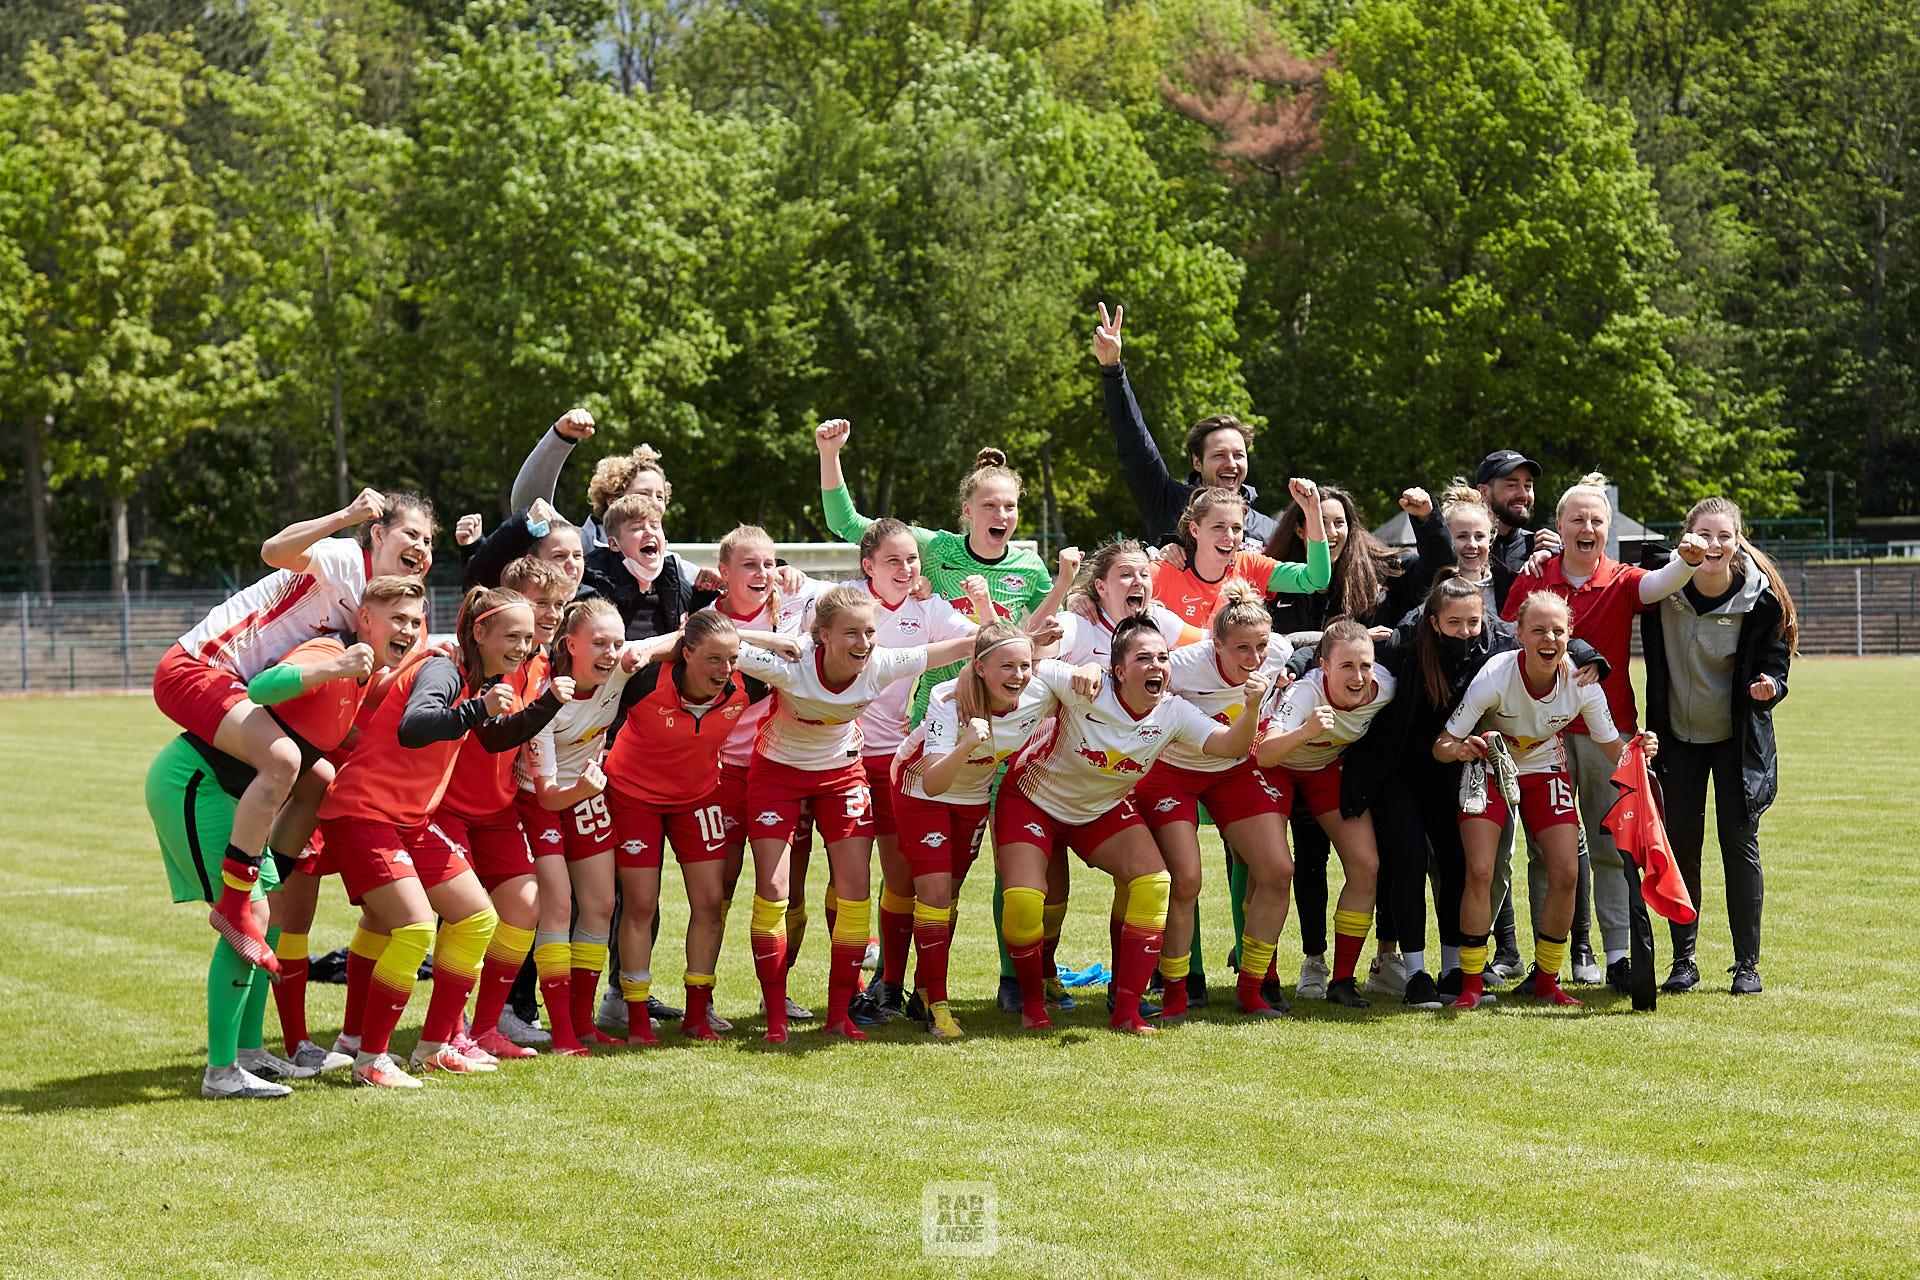 RB Leipzig -vs- Borussia Mönchengladbach